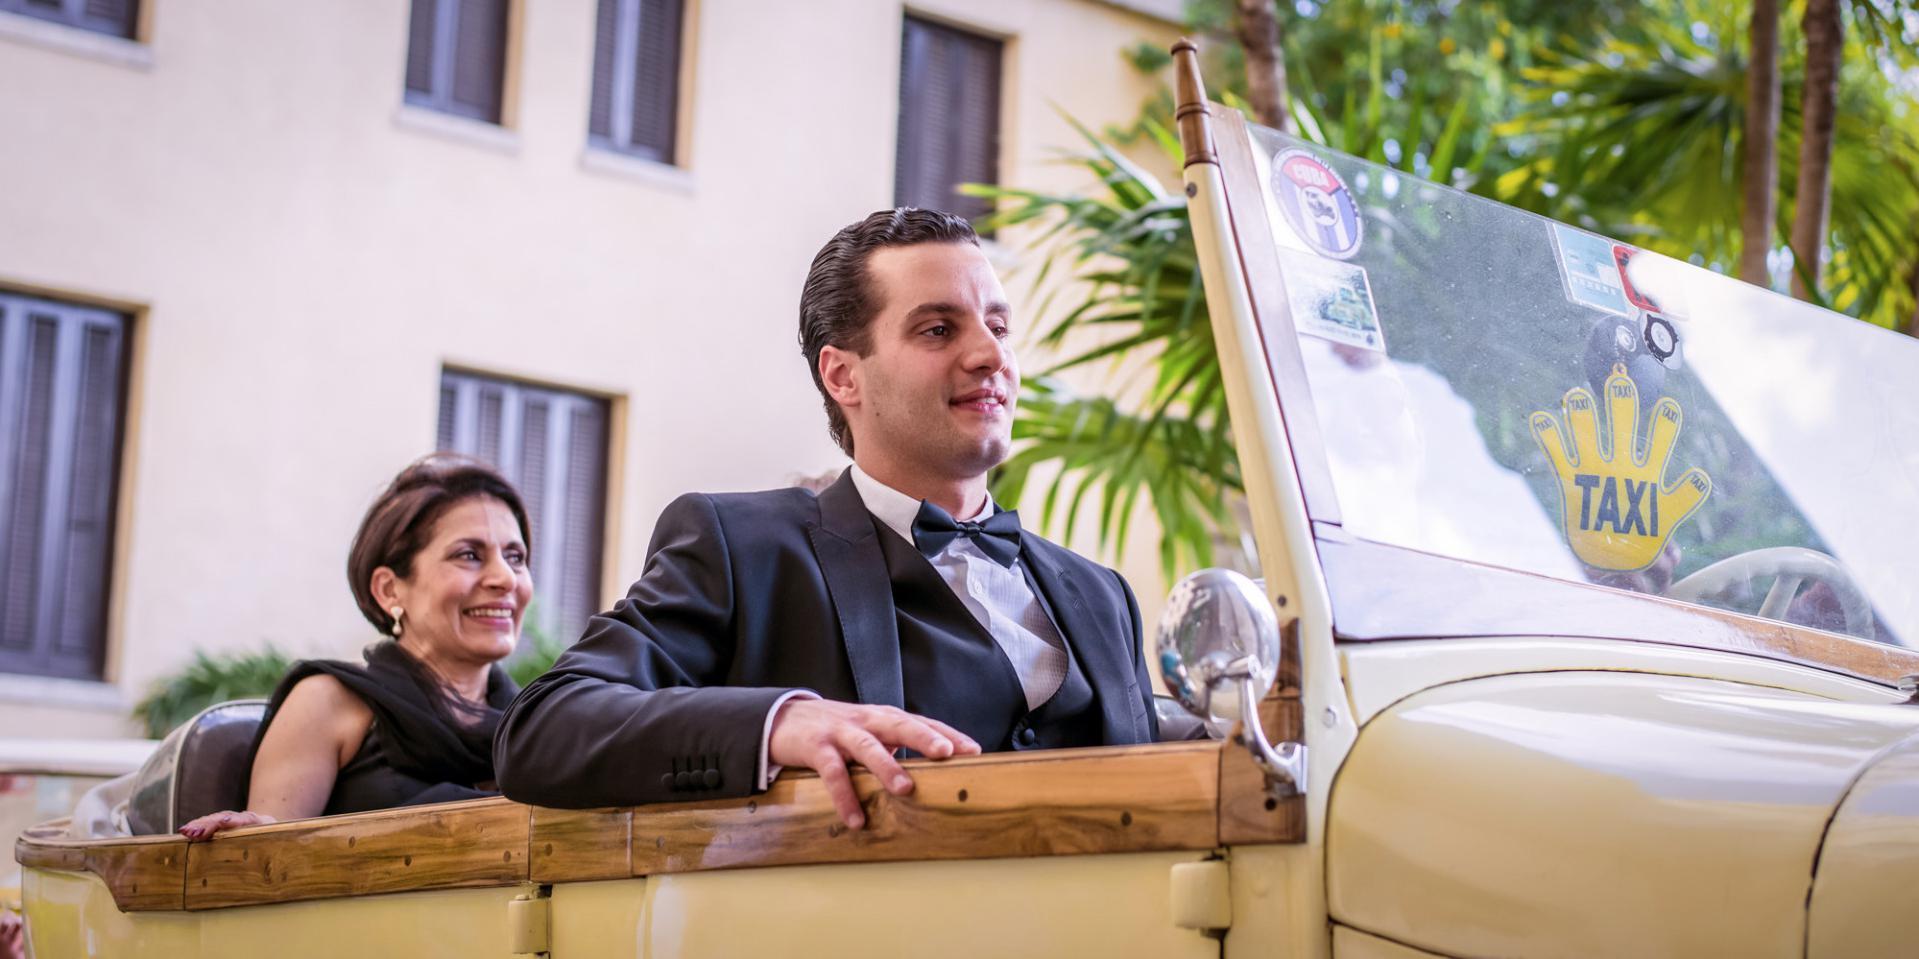 bodas-sin-clasificar-sin-tema-cuba-27541.jpg